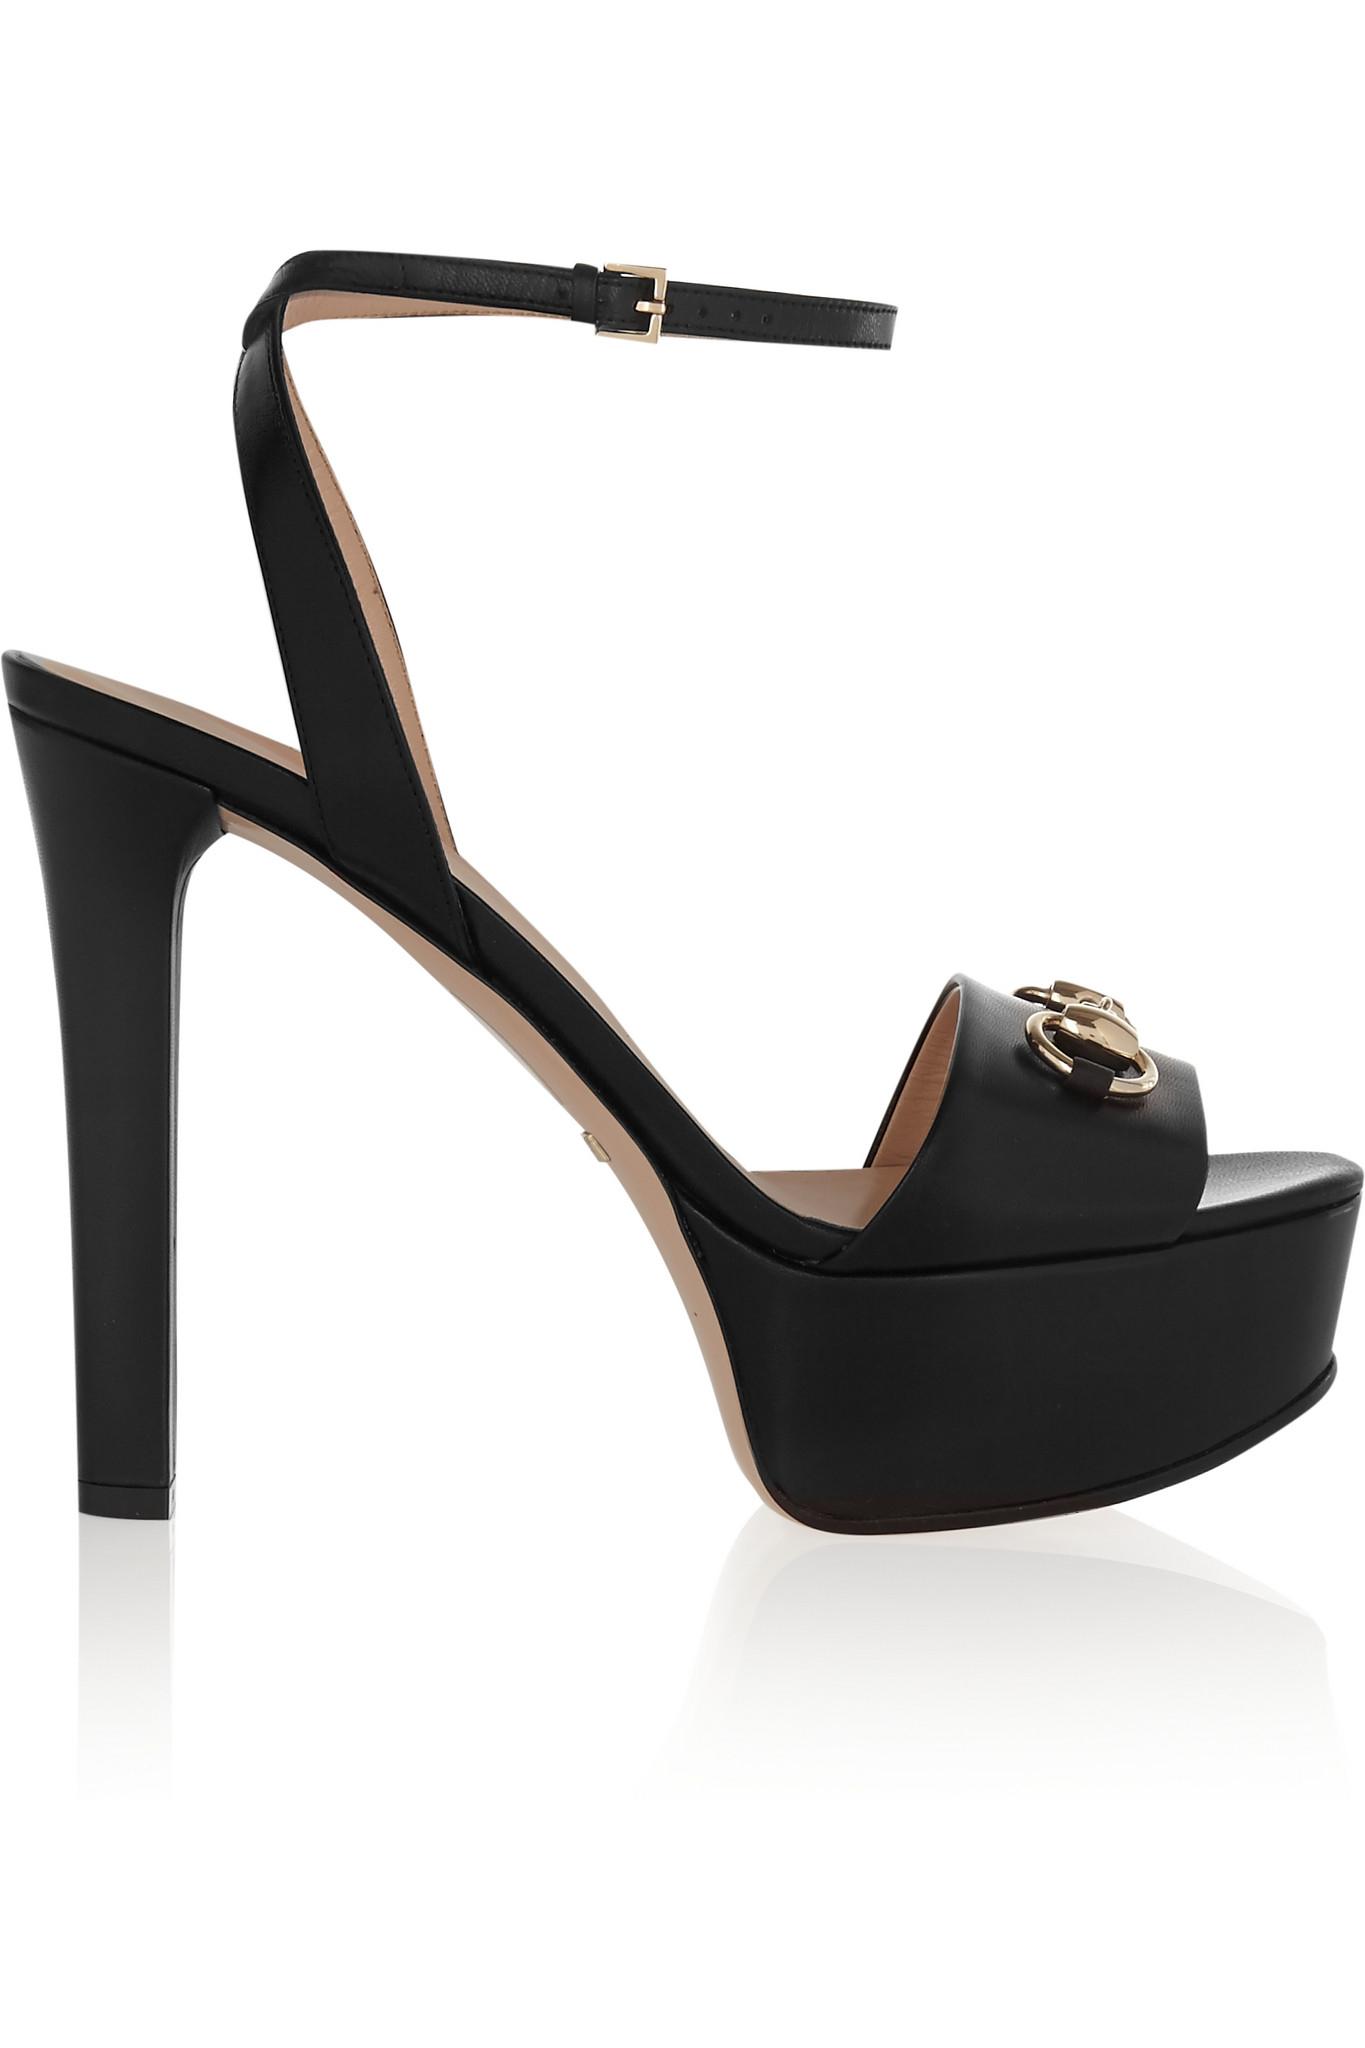 4518b76c8c Gucci Horsebit-detailed Leather Platform Sandals in Black - Lyst